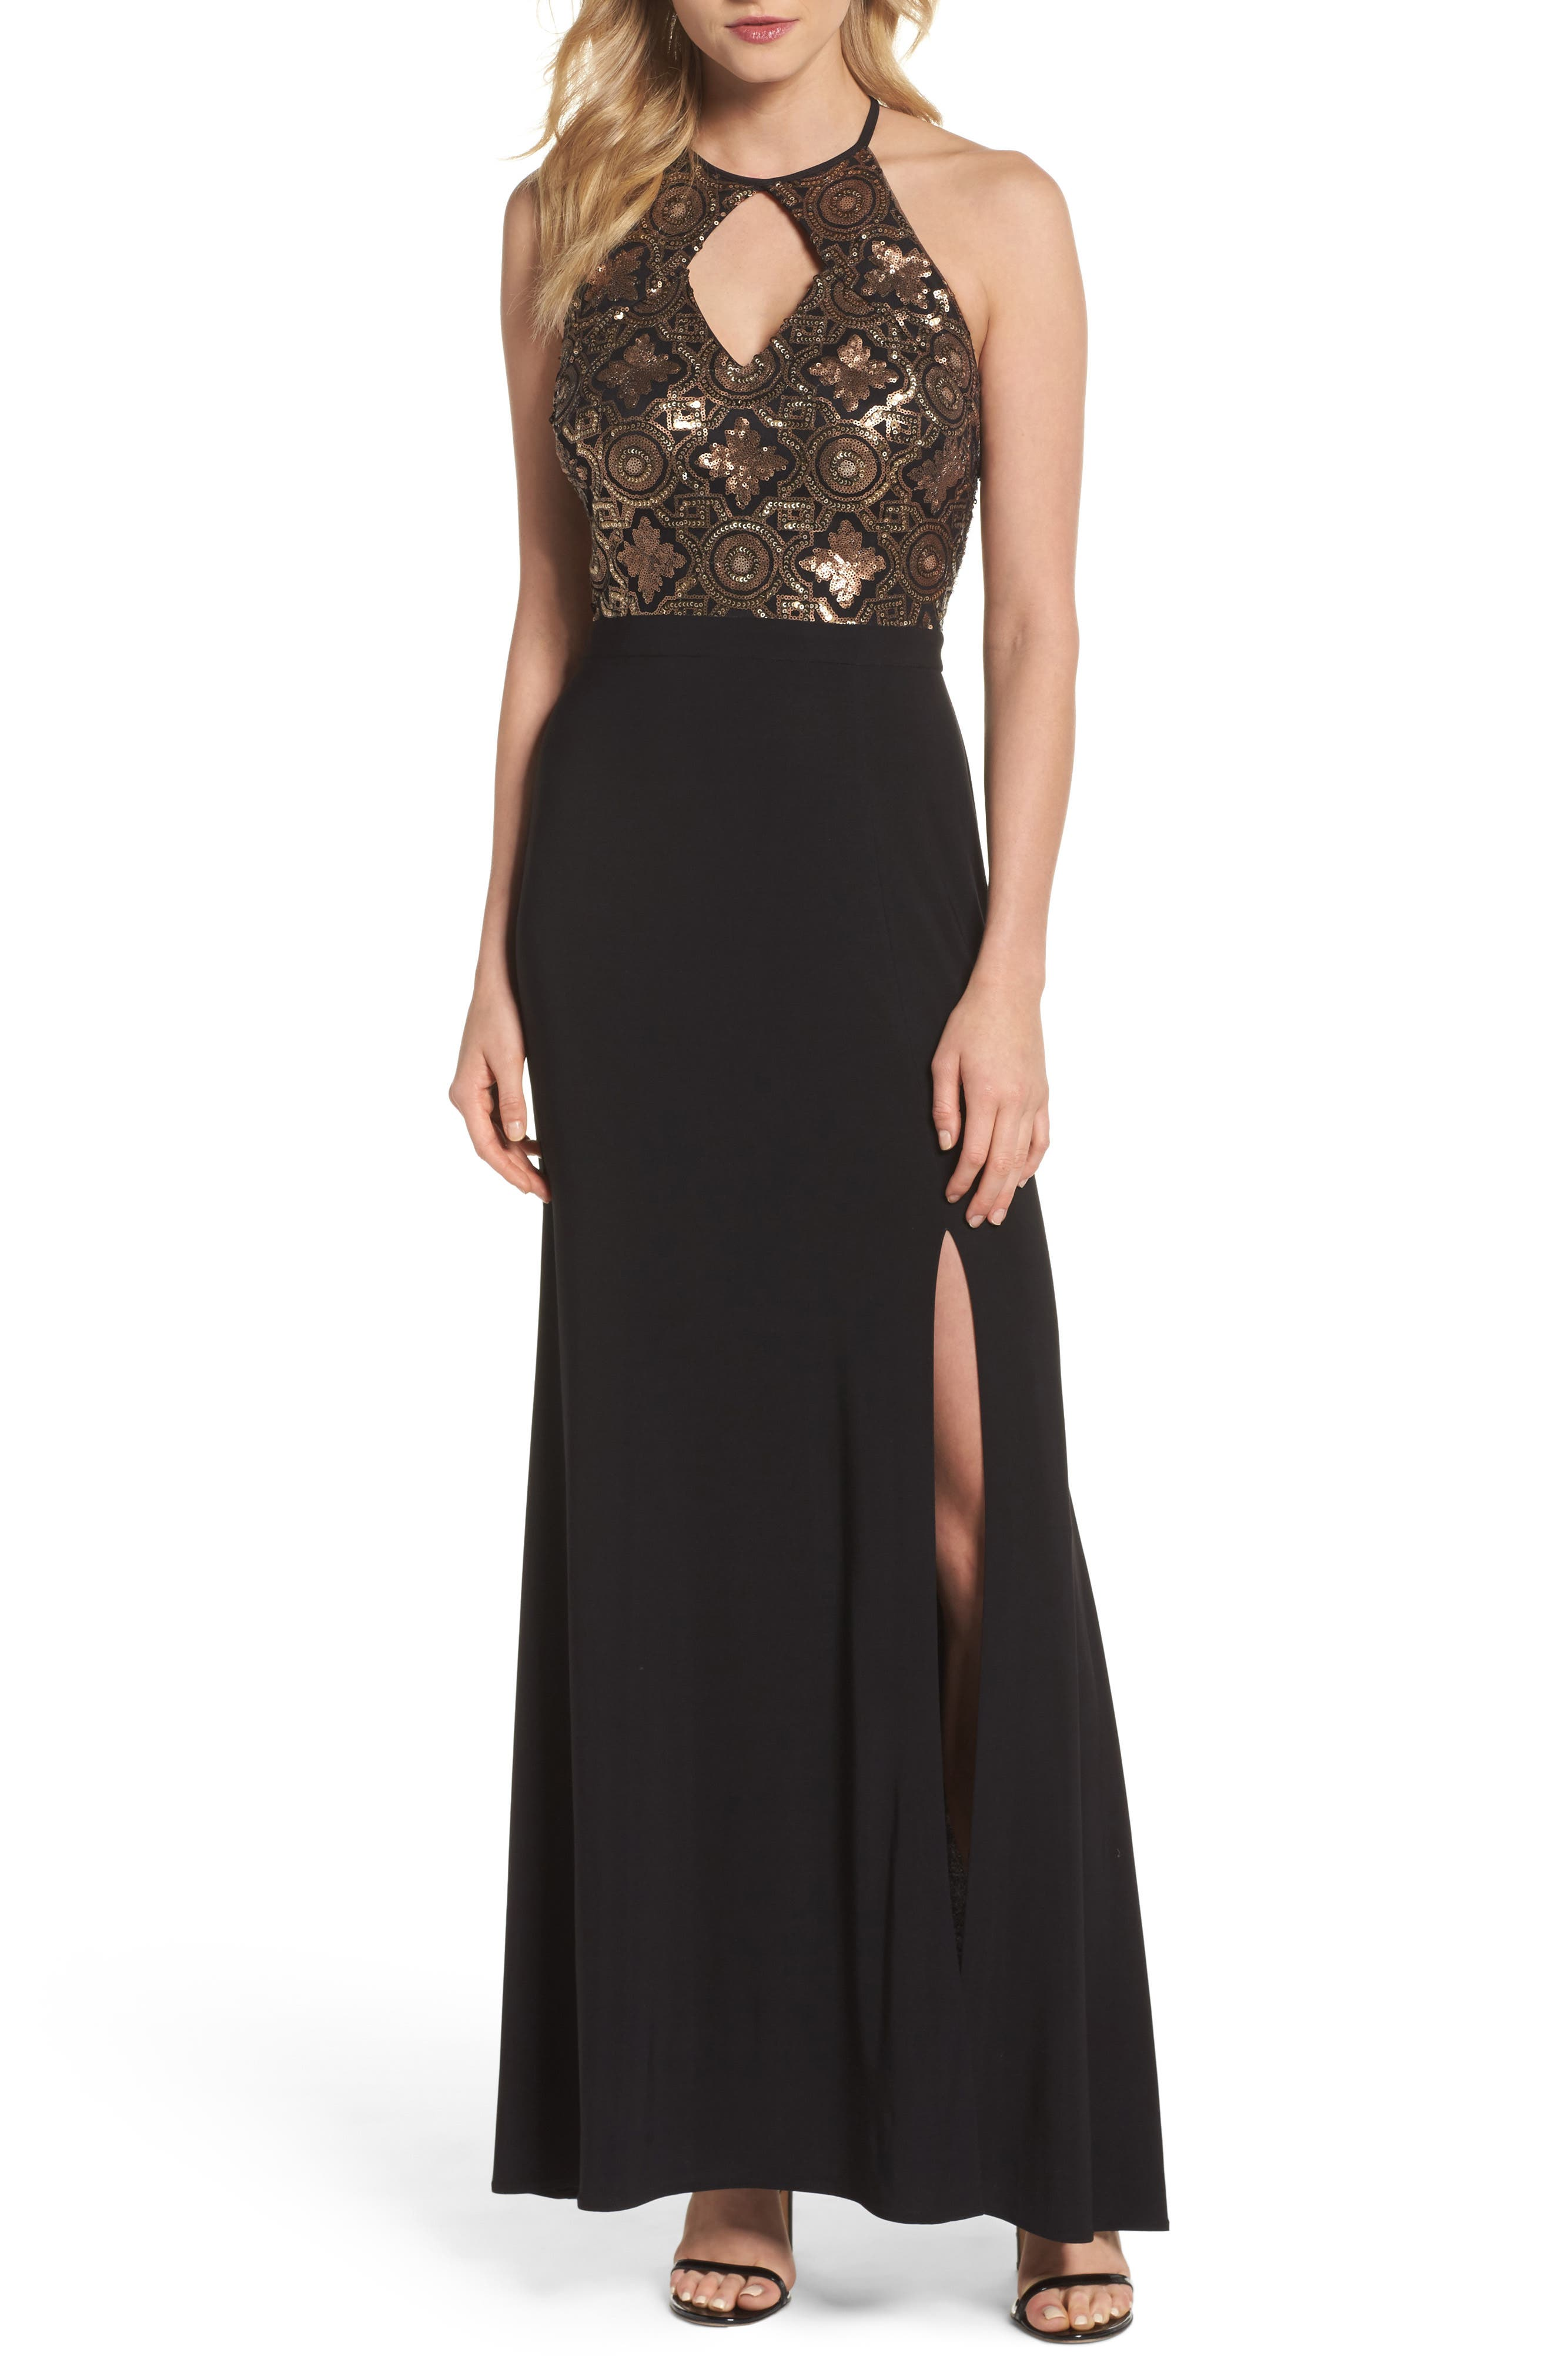 Sequin Cutout Bodice Gown,                             Main thumbnail 1, color,                             Black/ Gold